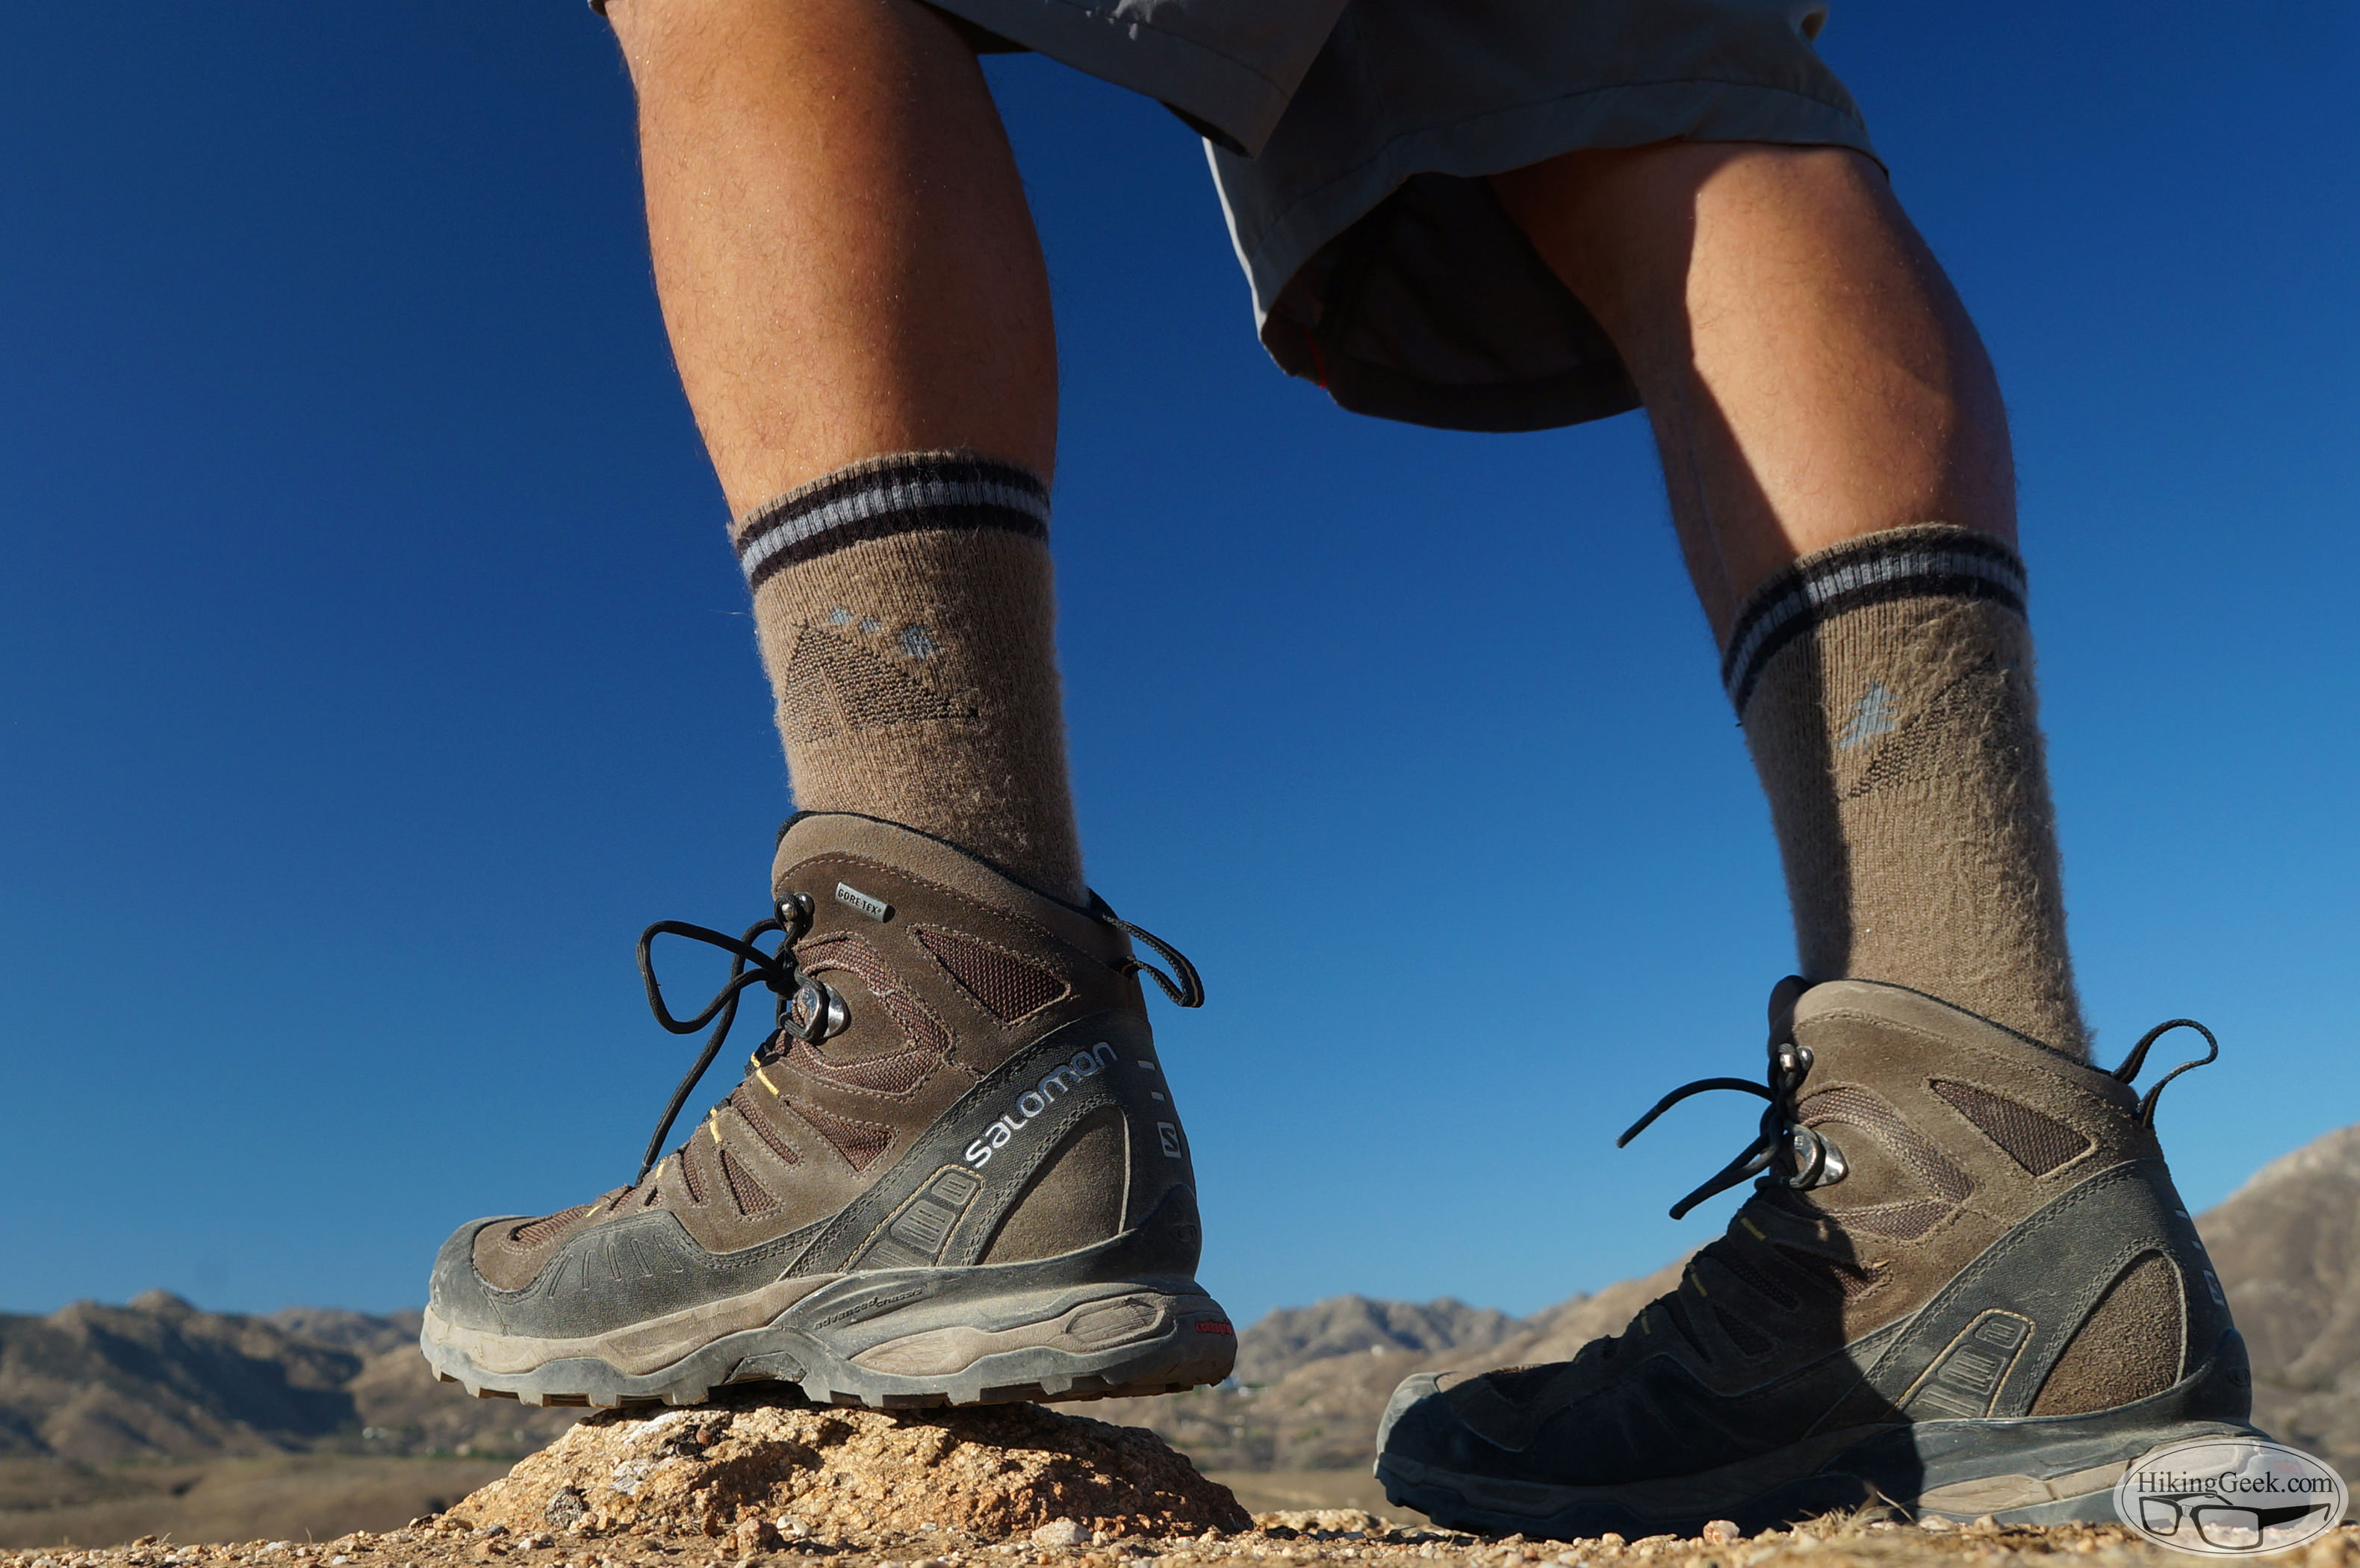 Gear Review  Farm to Feet Merino Wool Socks - Hiking Photos 8e4b9d2db94e